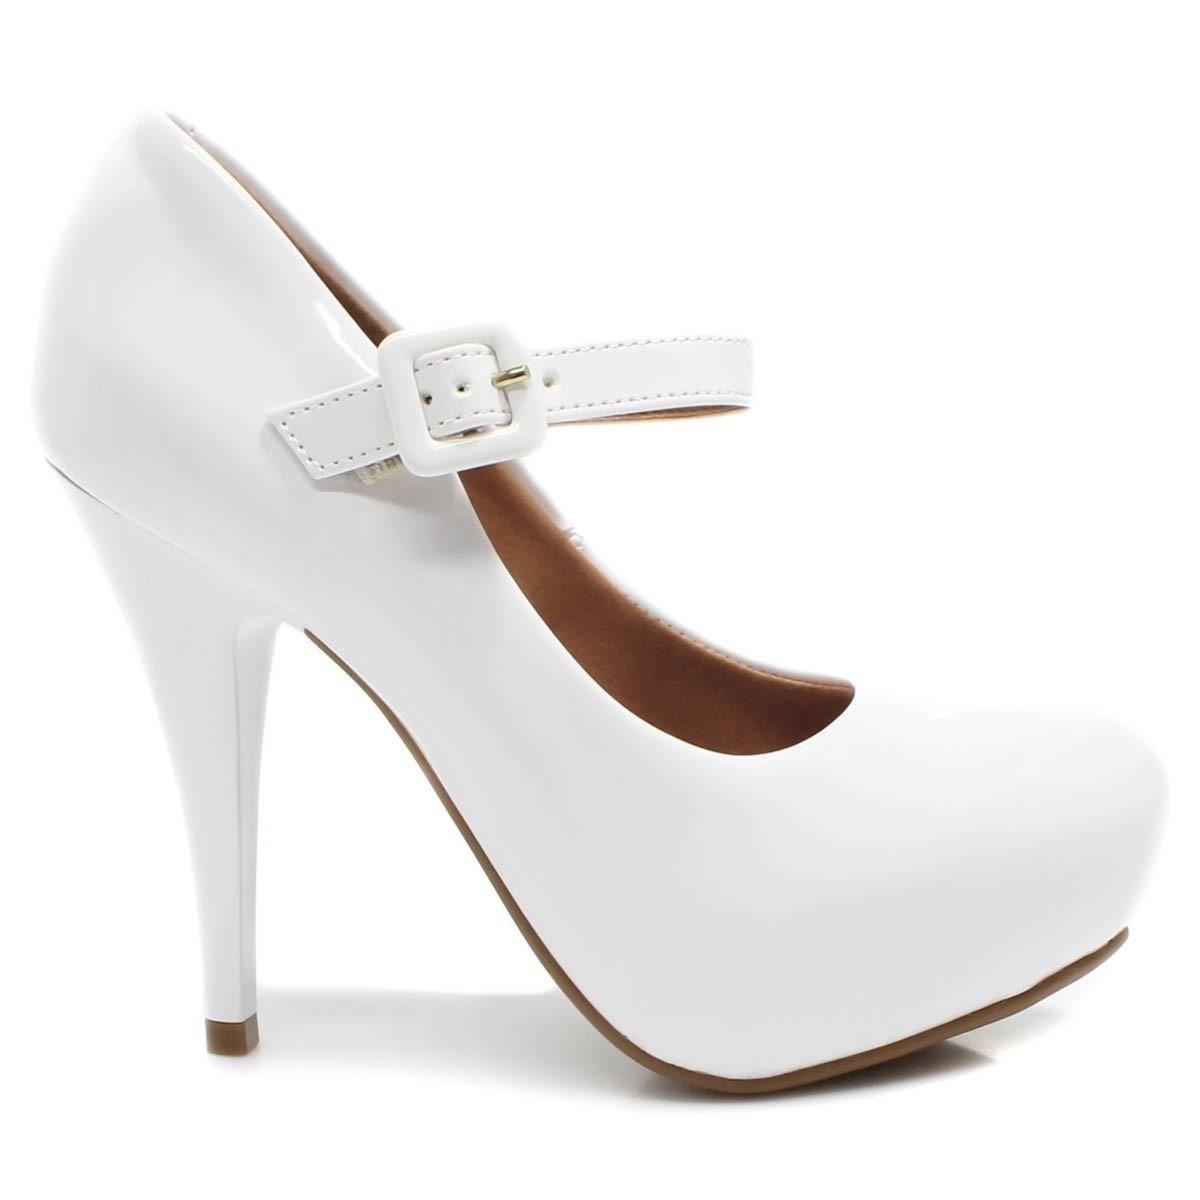 09b8aaed7 sapato feminino boneca salto alto vizzano casamento branco. Carregando zoom.